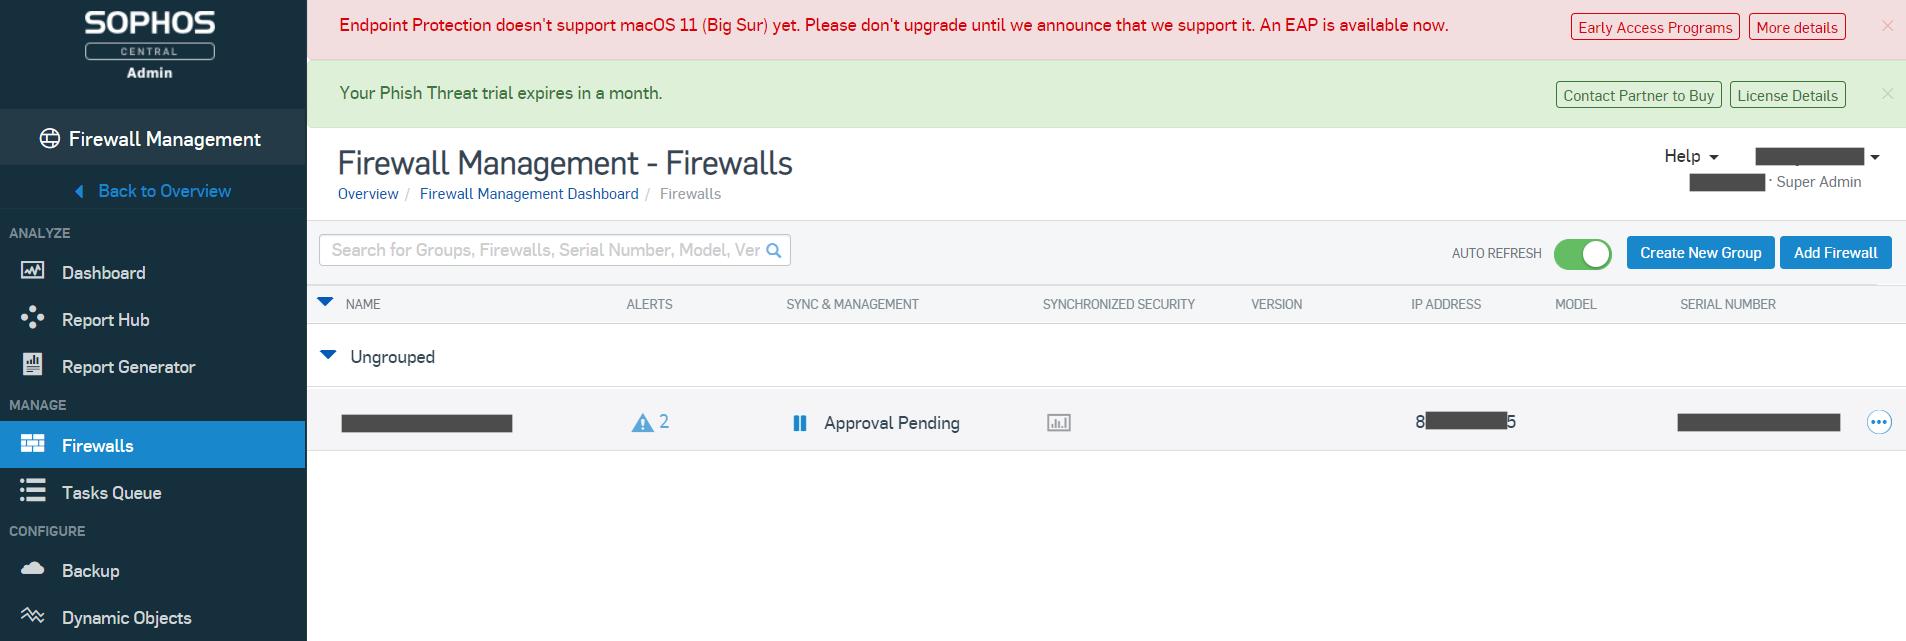 Approve firewall